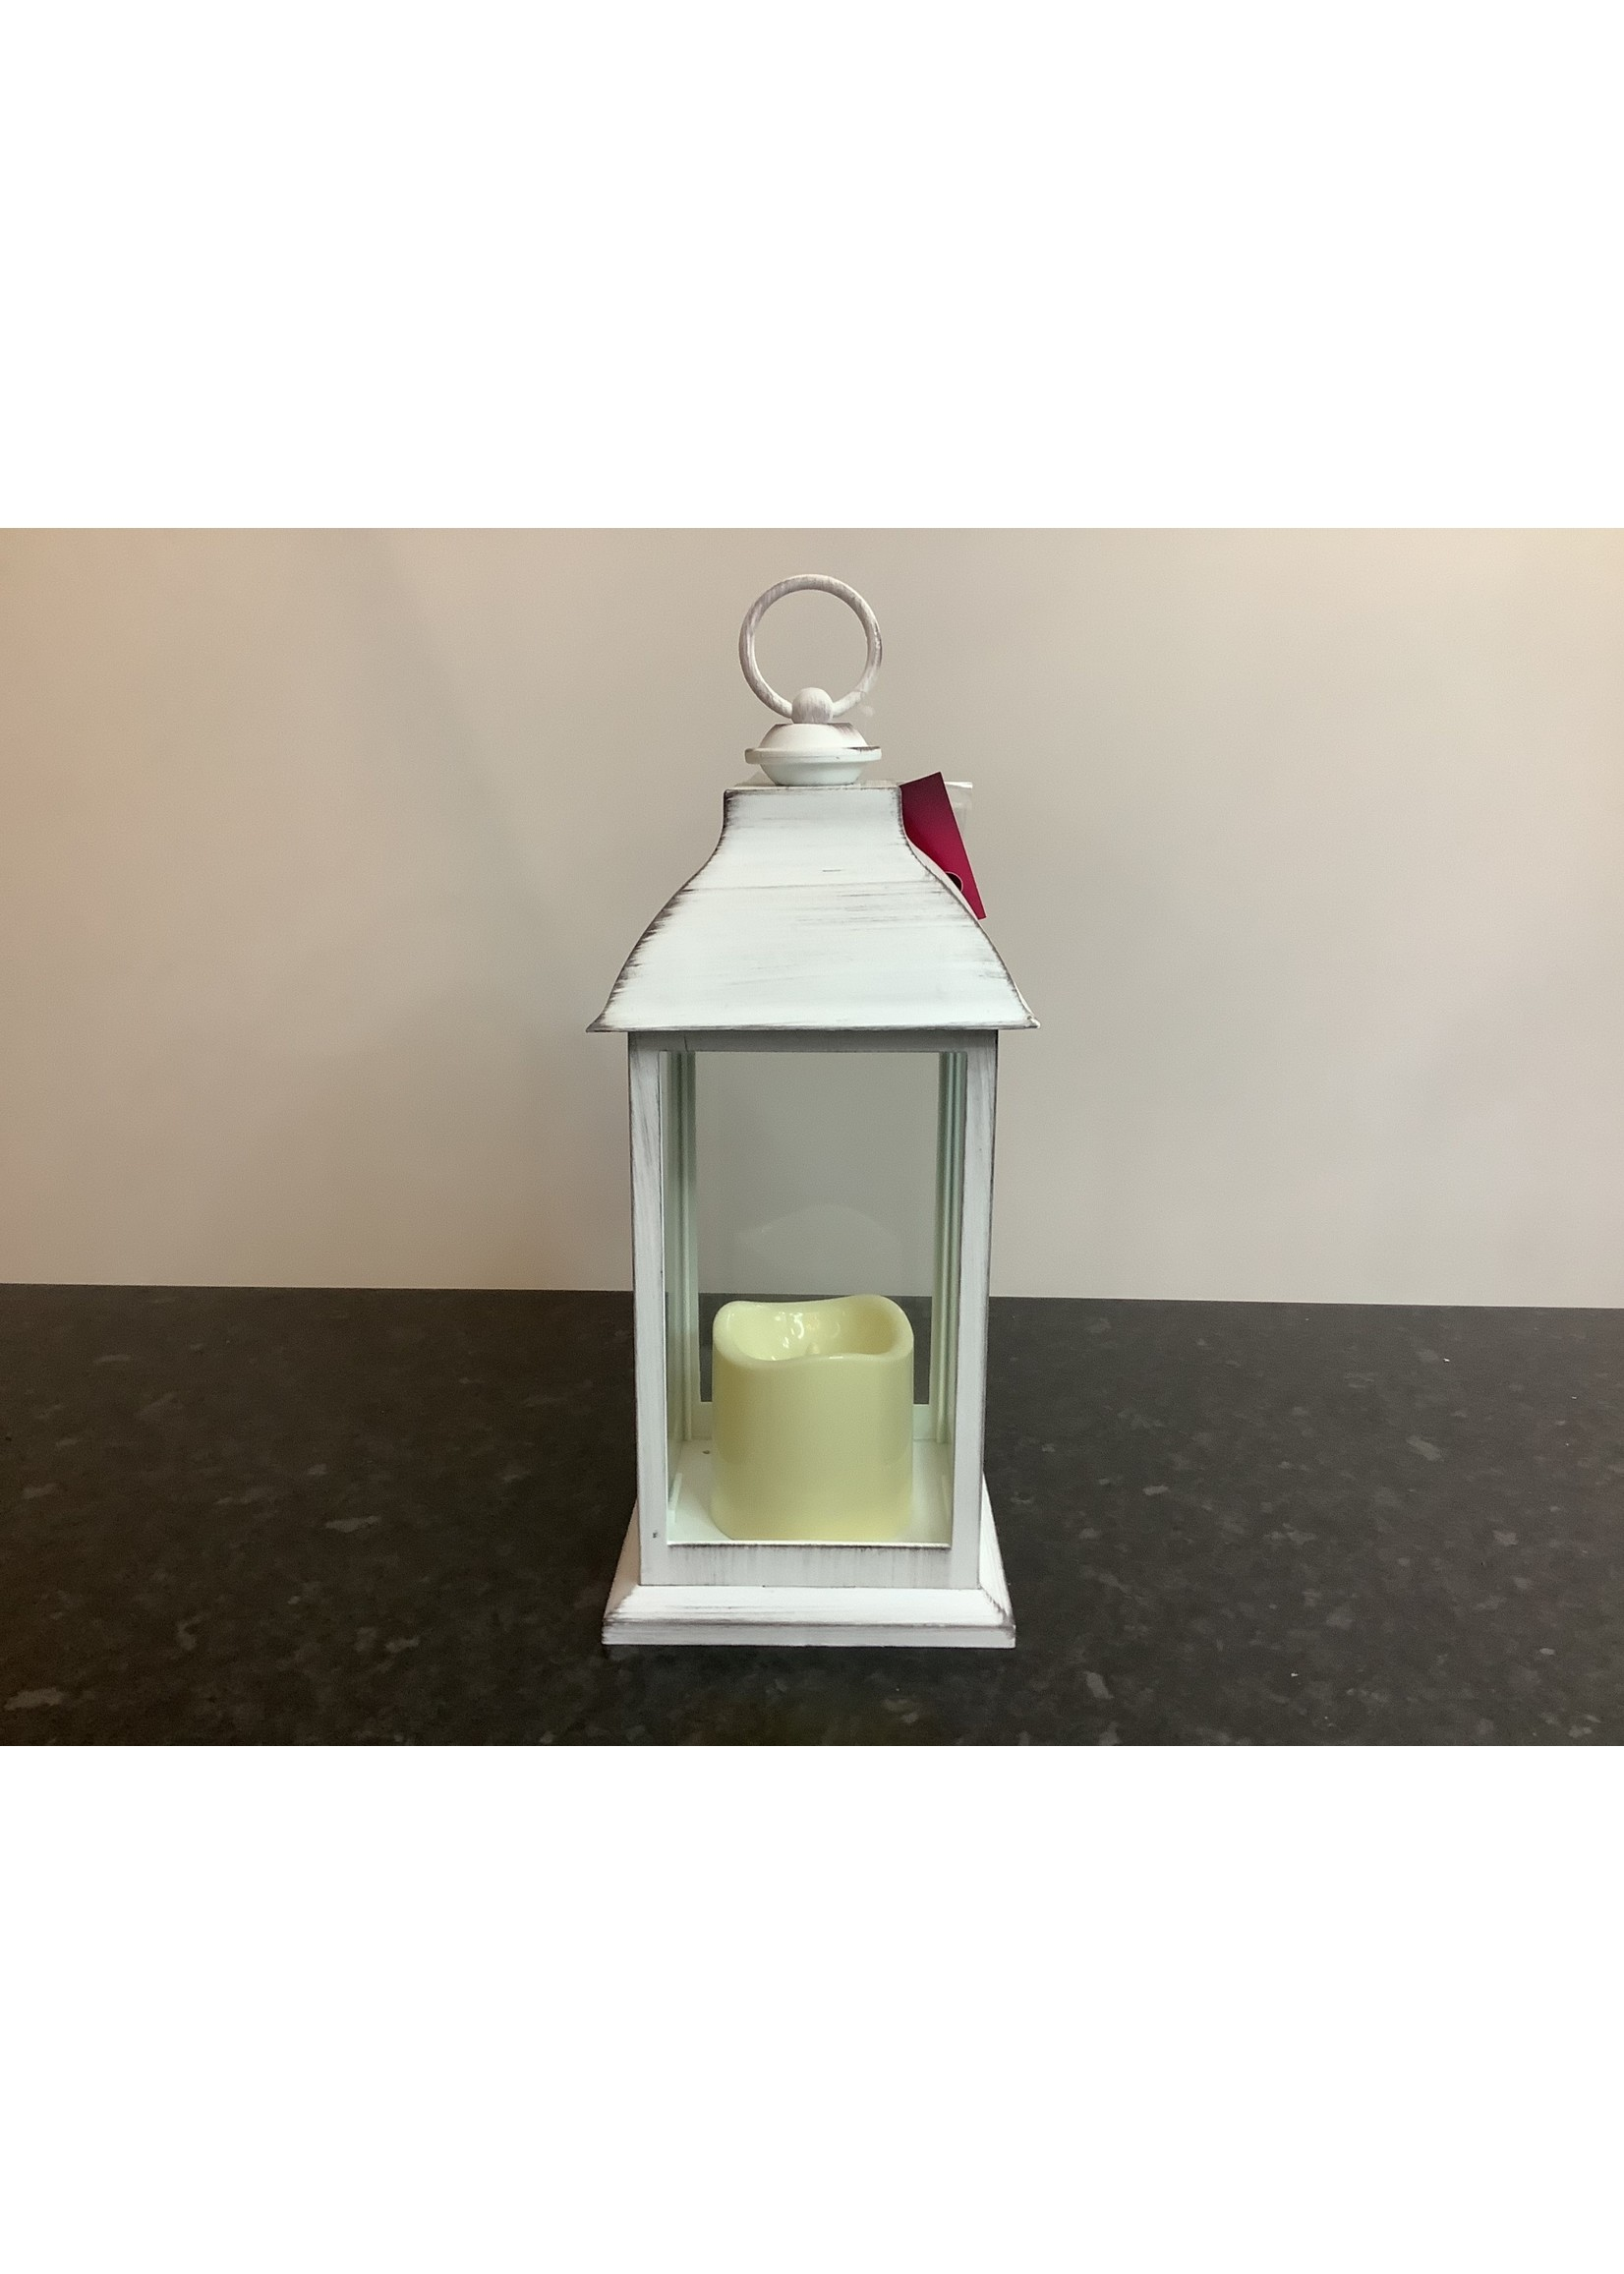 LED Lantern small white 35cm tall